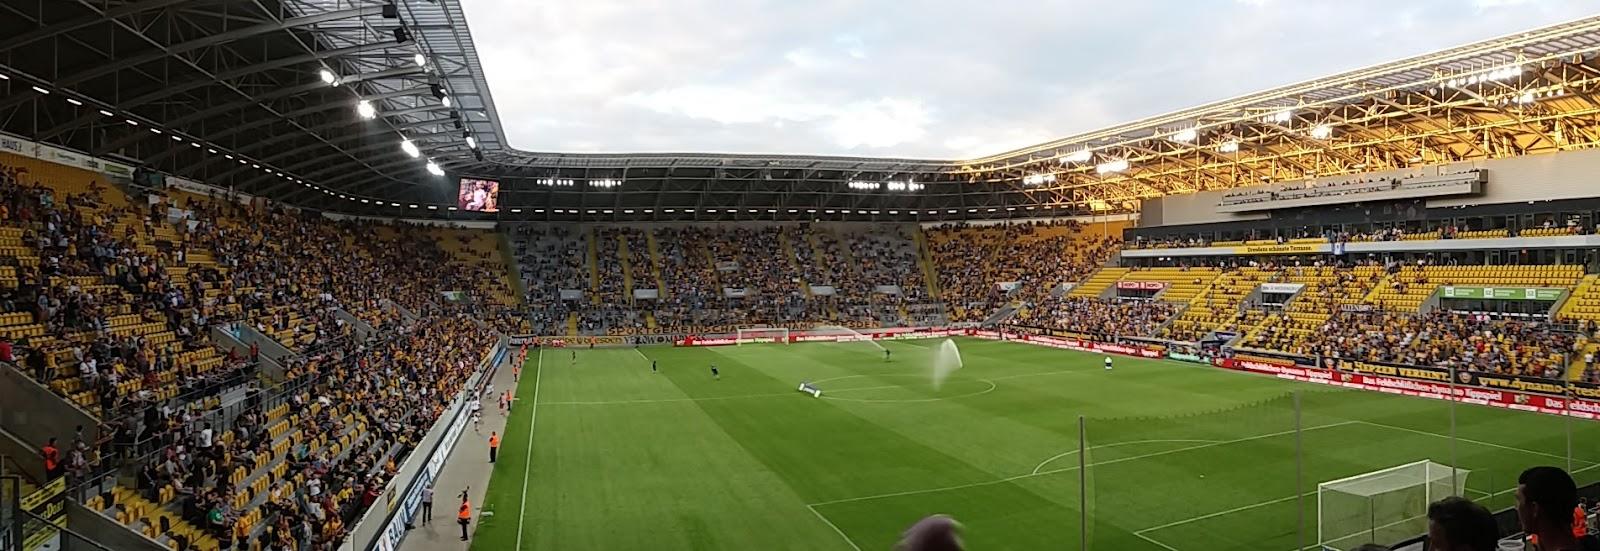 Dynamo Stadion Dresden